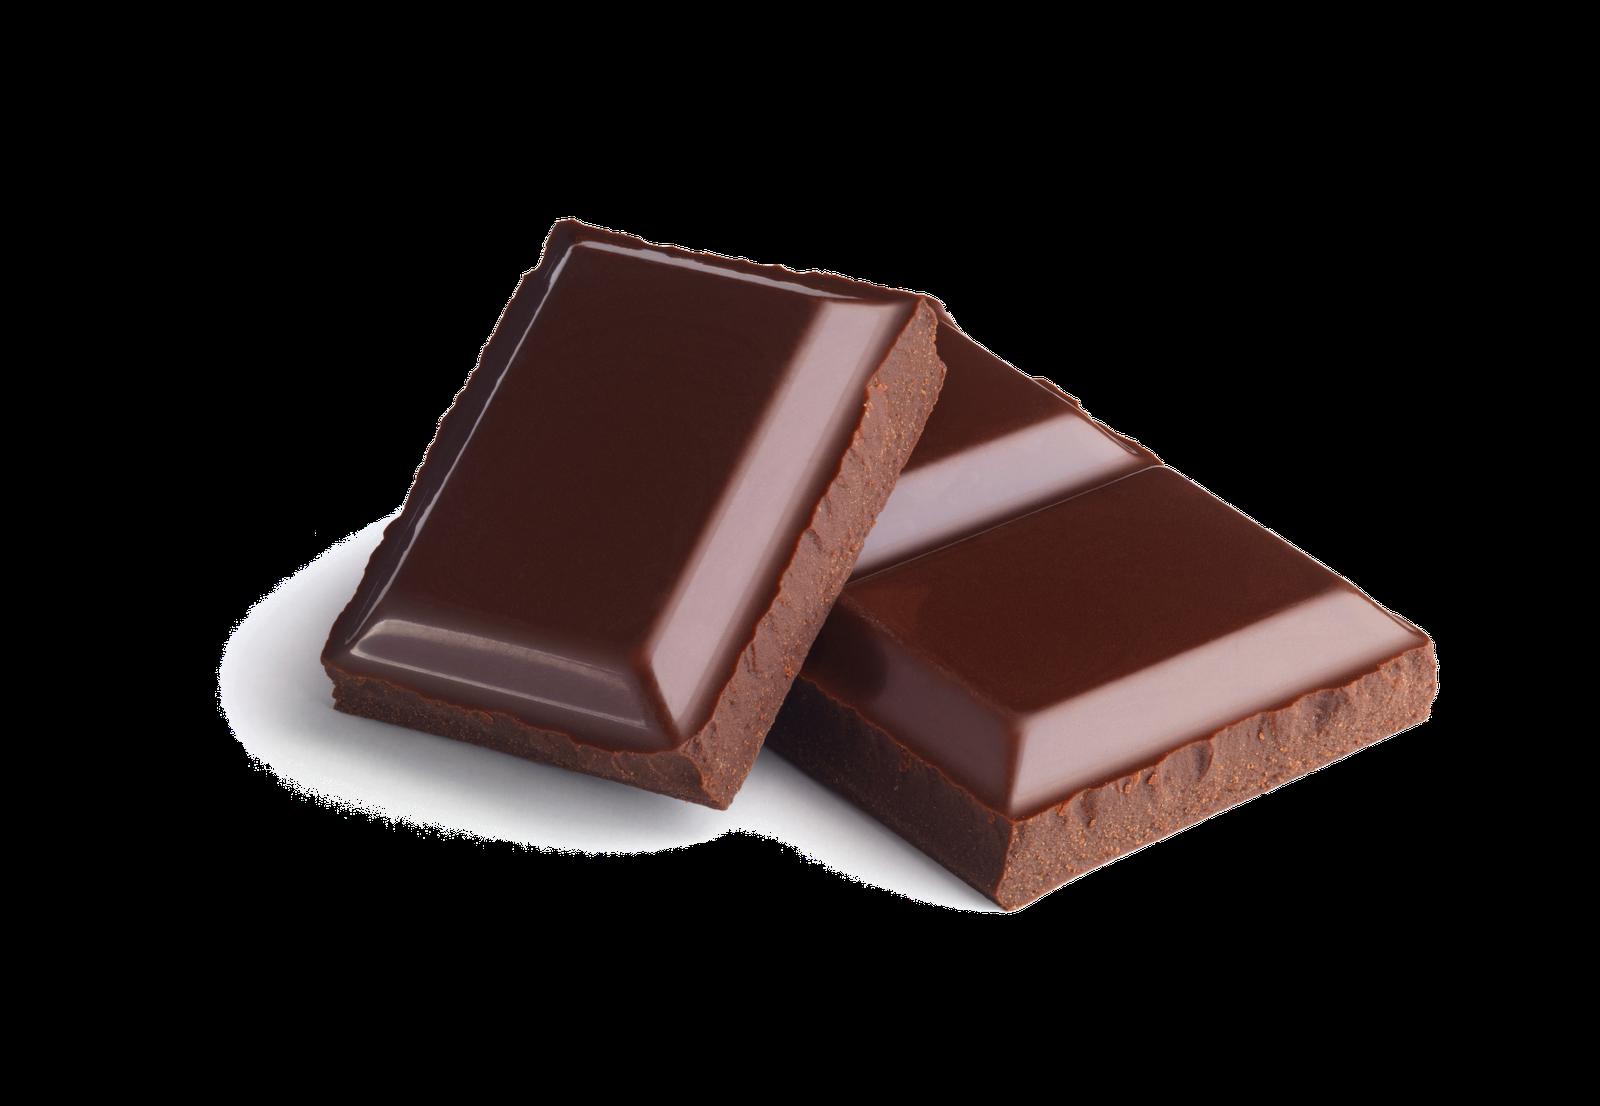 умеет картинка горький шоколад на прозрачном фоне привыкли, что